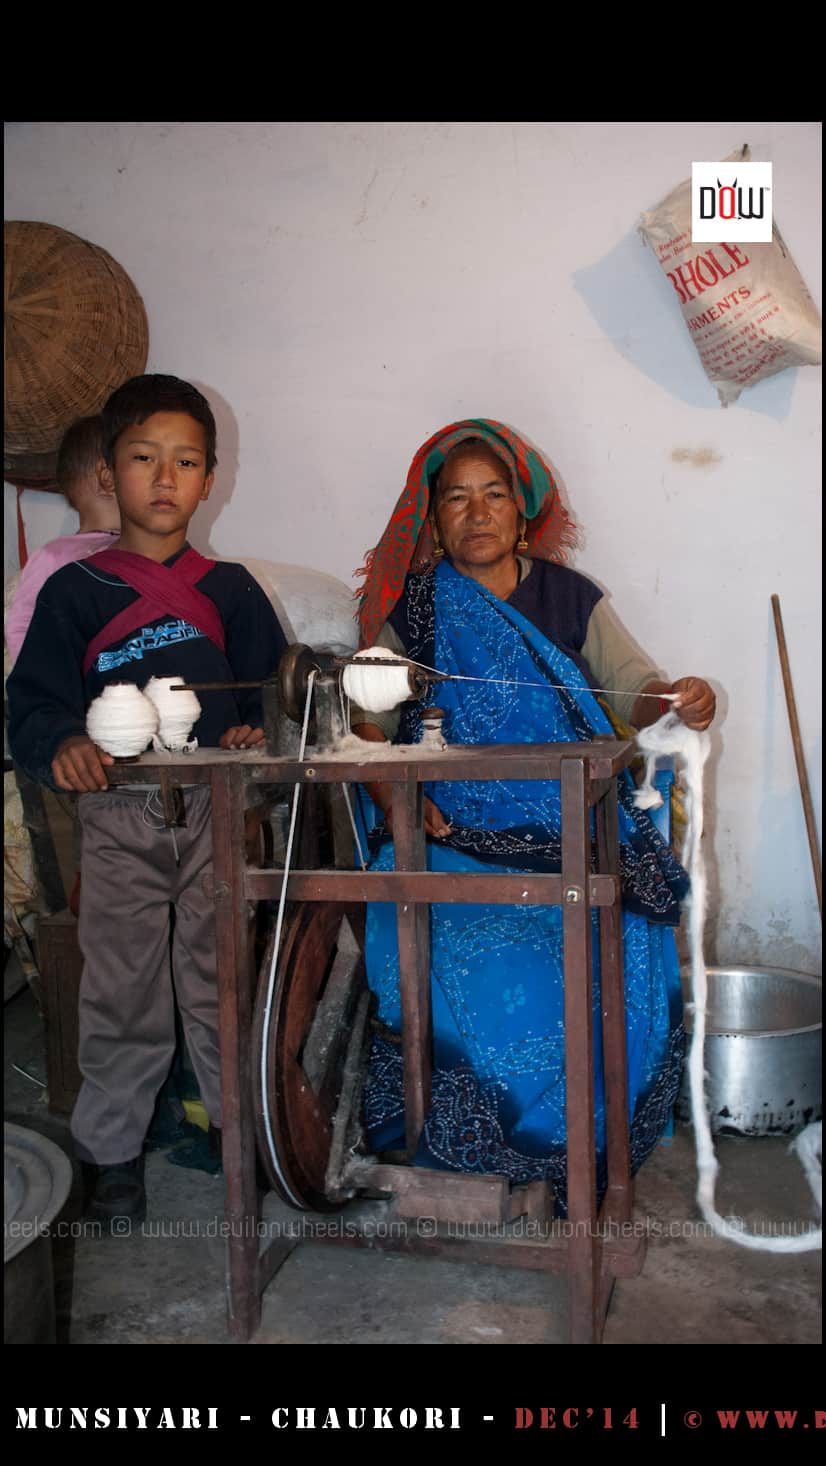 Prema ji, continuing the old heritage of Darkot Village